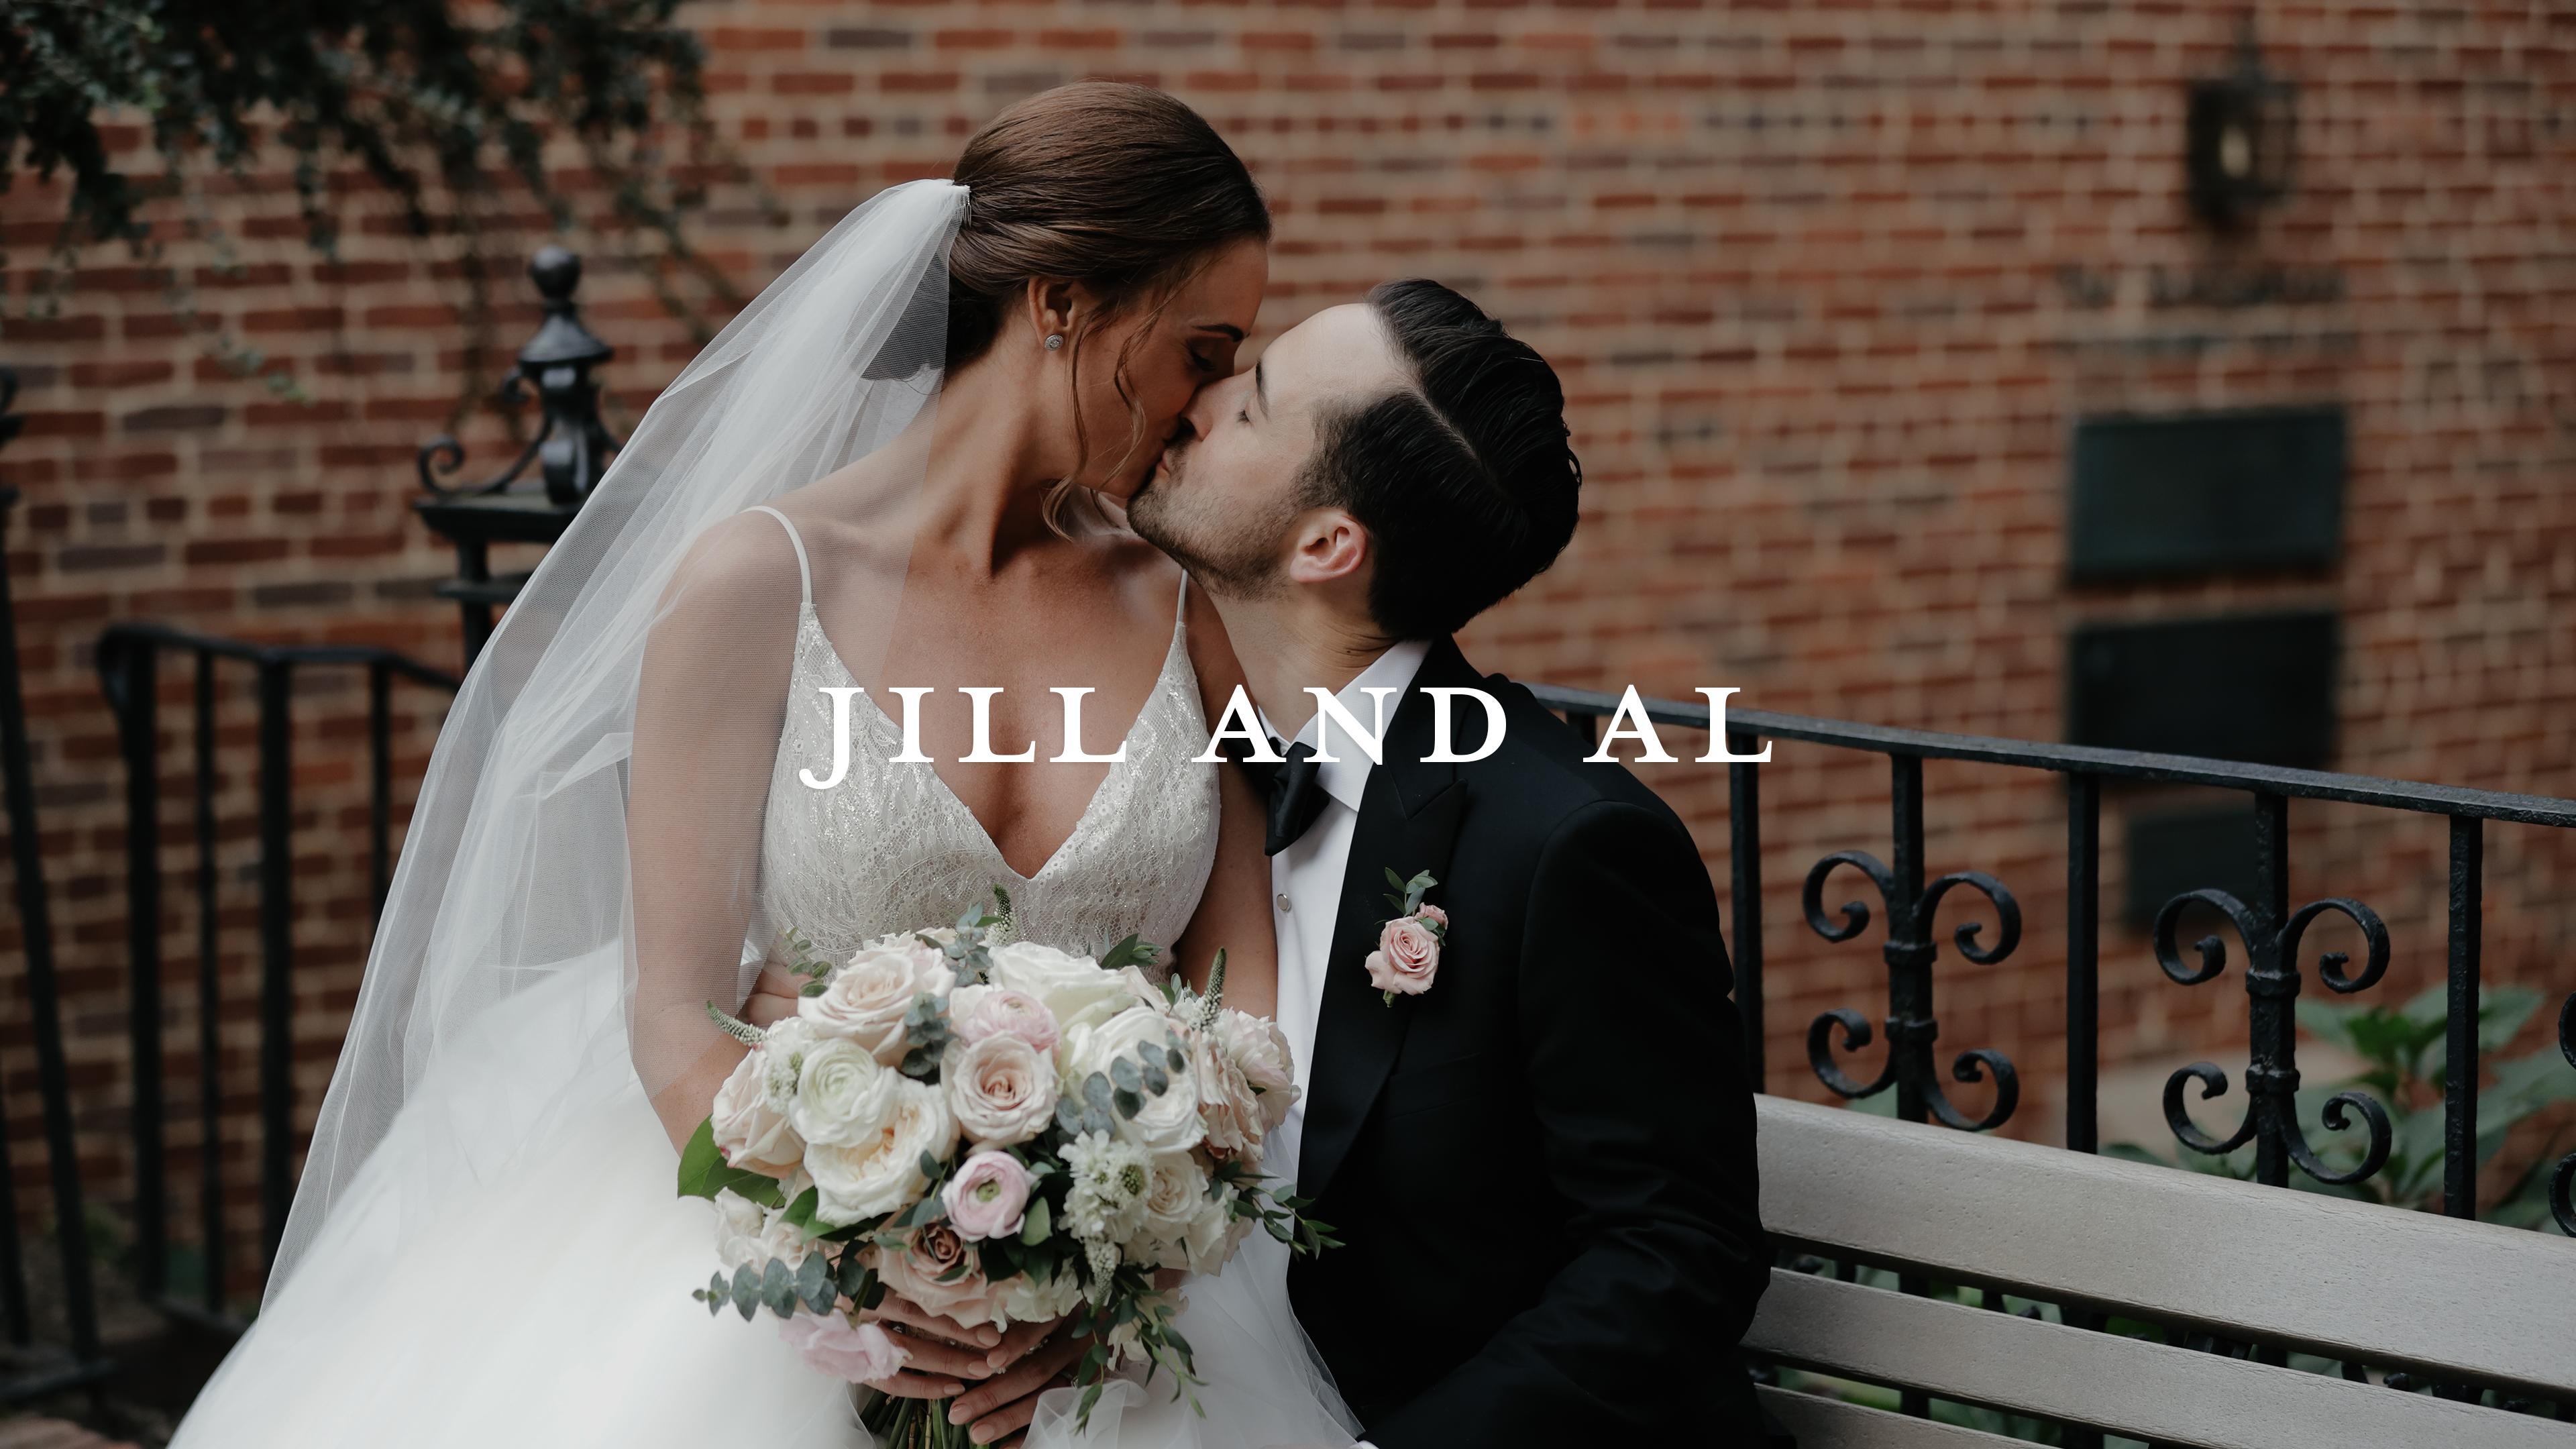 Jill + Al | Boston, Massachusetts | The State Room